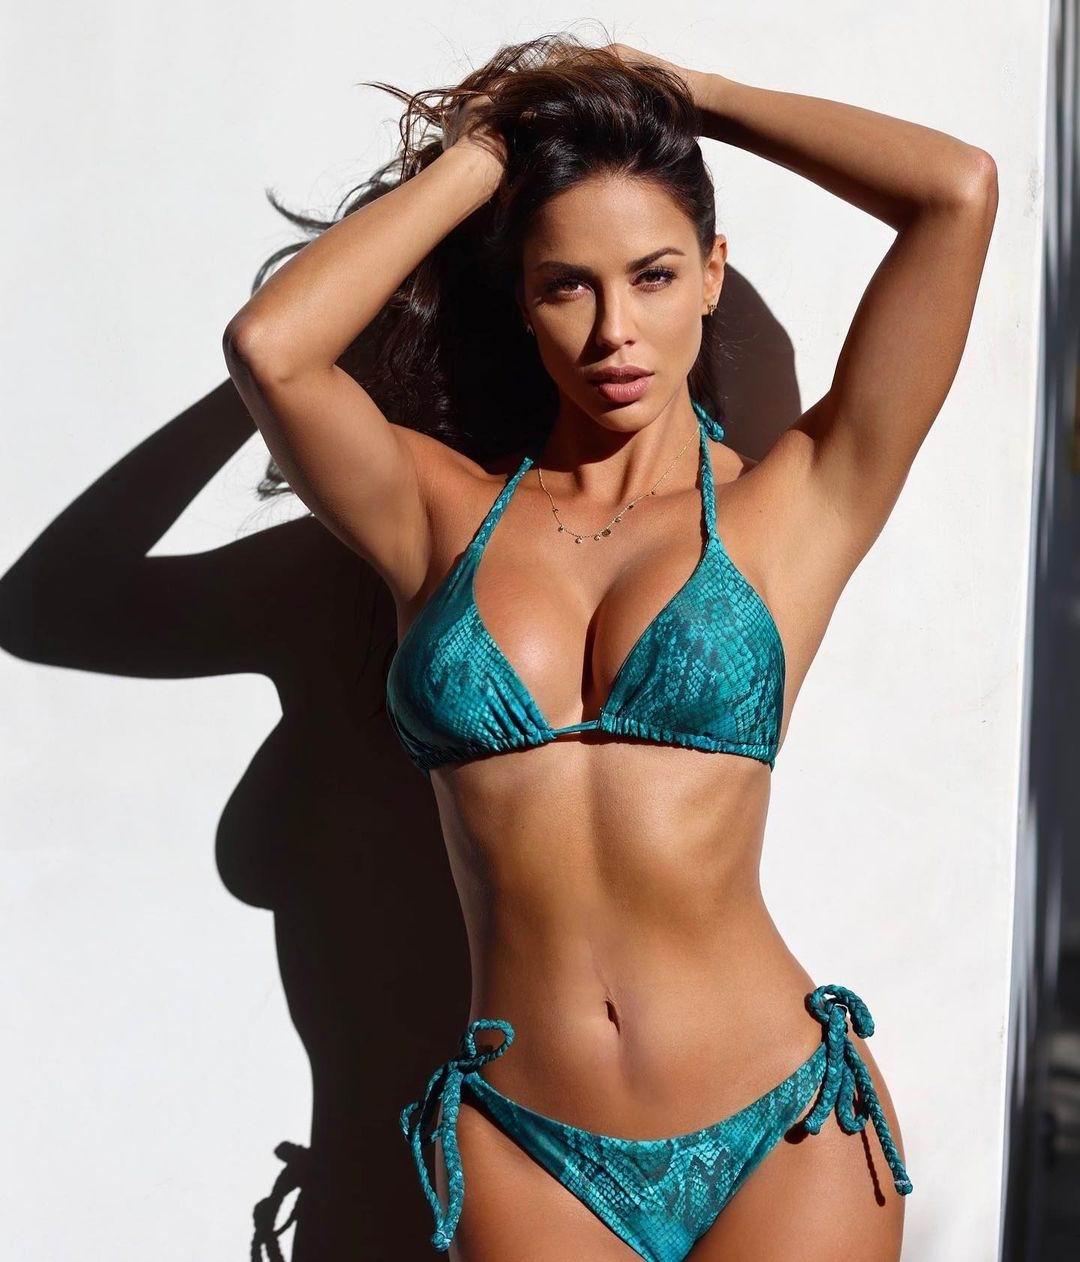 Model Jeannette